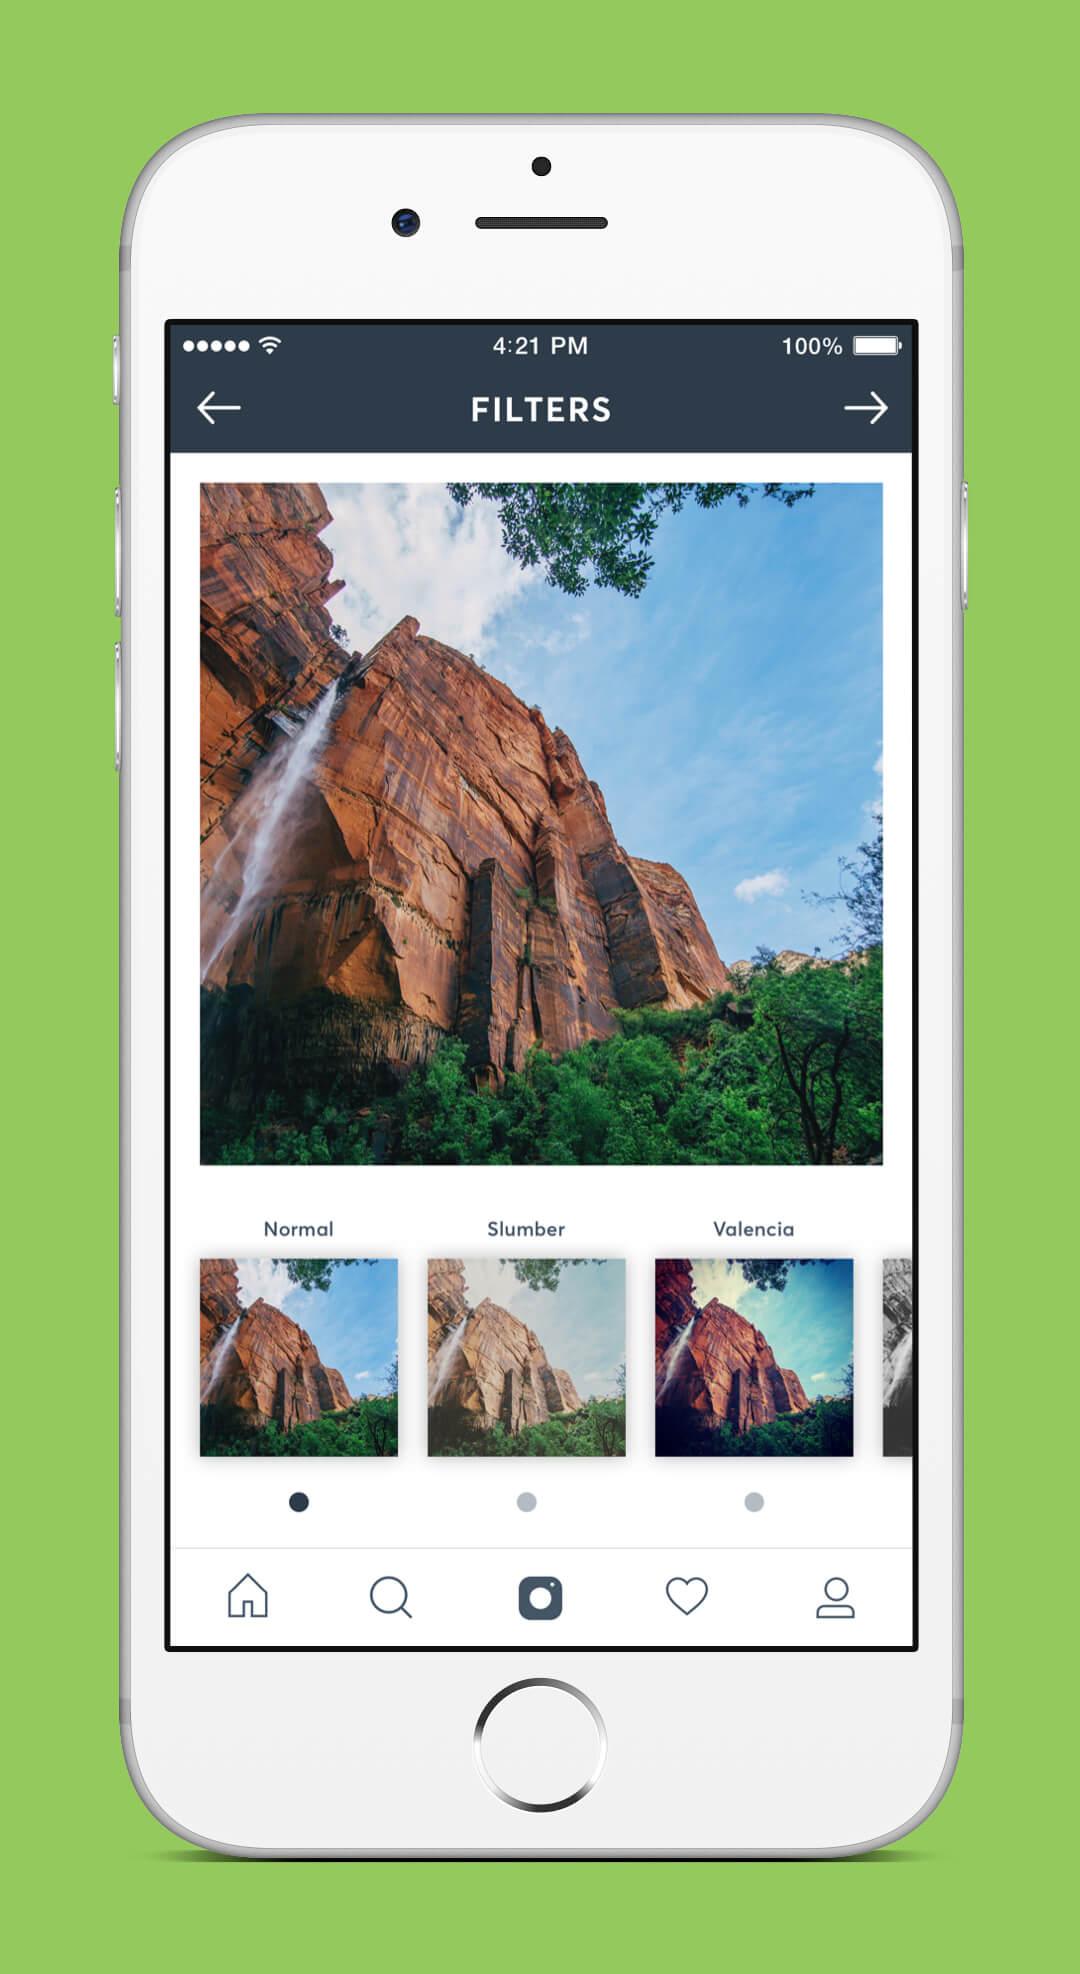 Instagram Redesign - Filter Screen